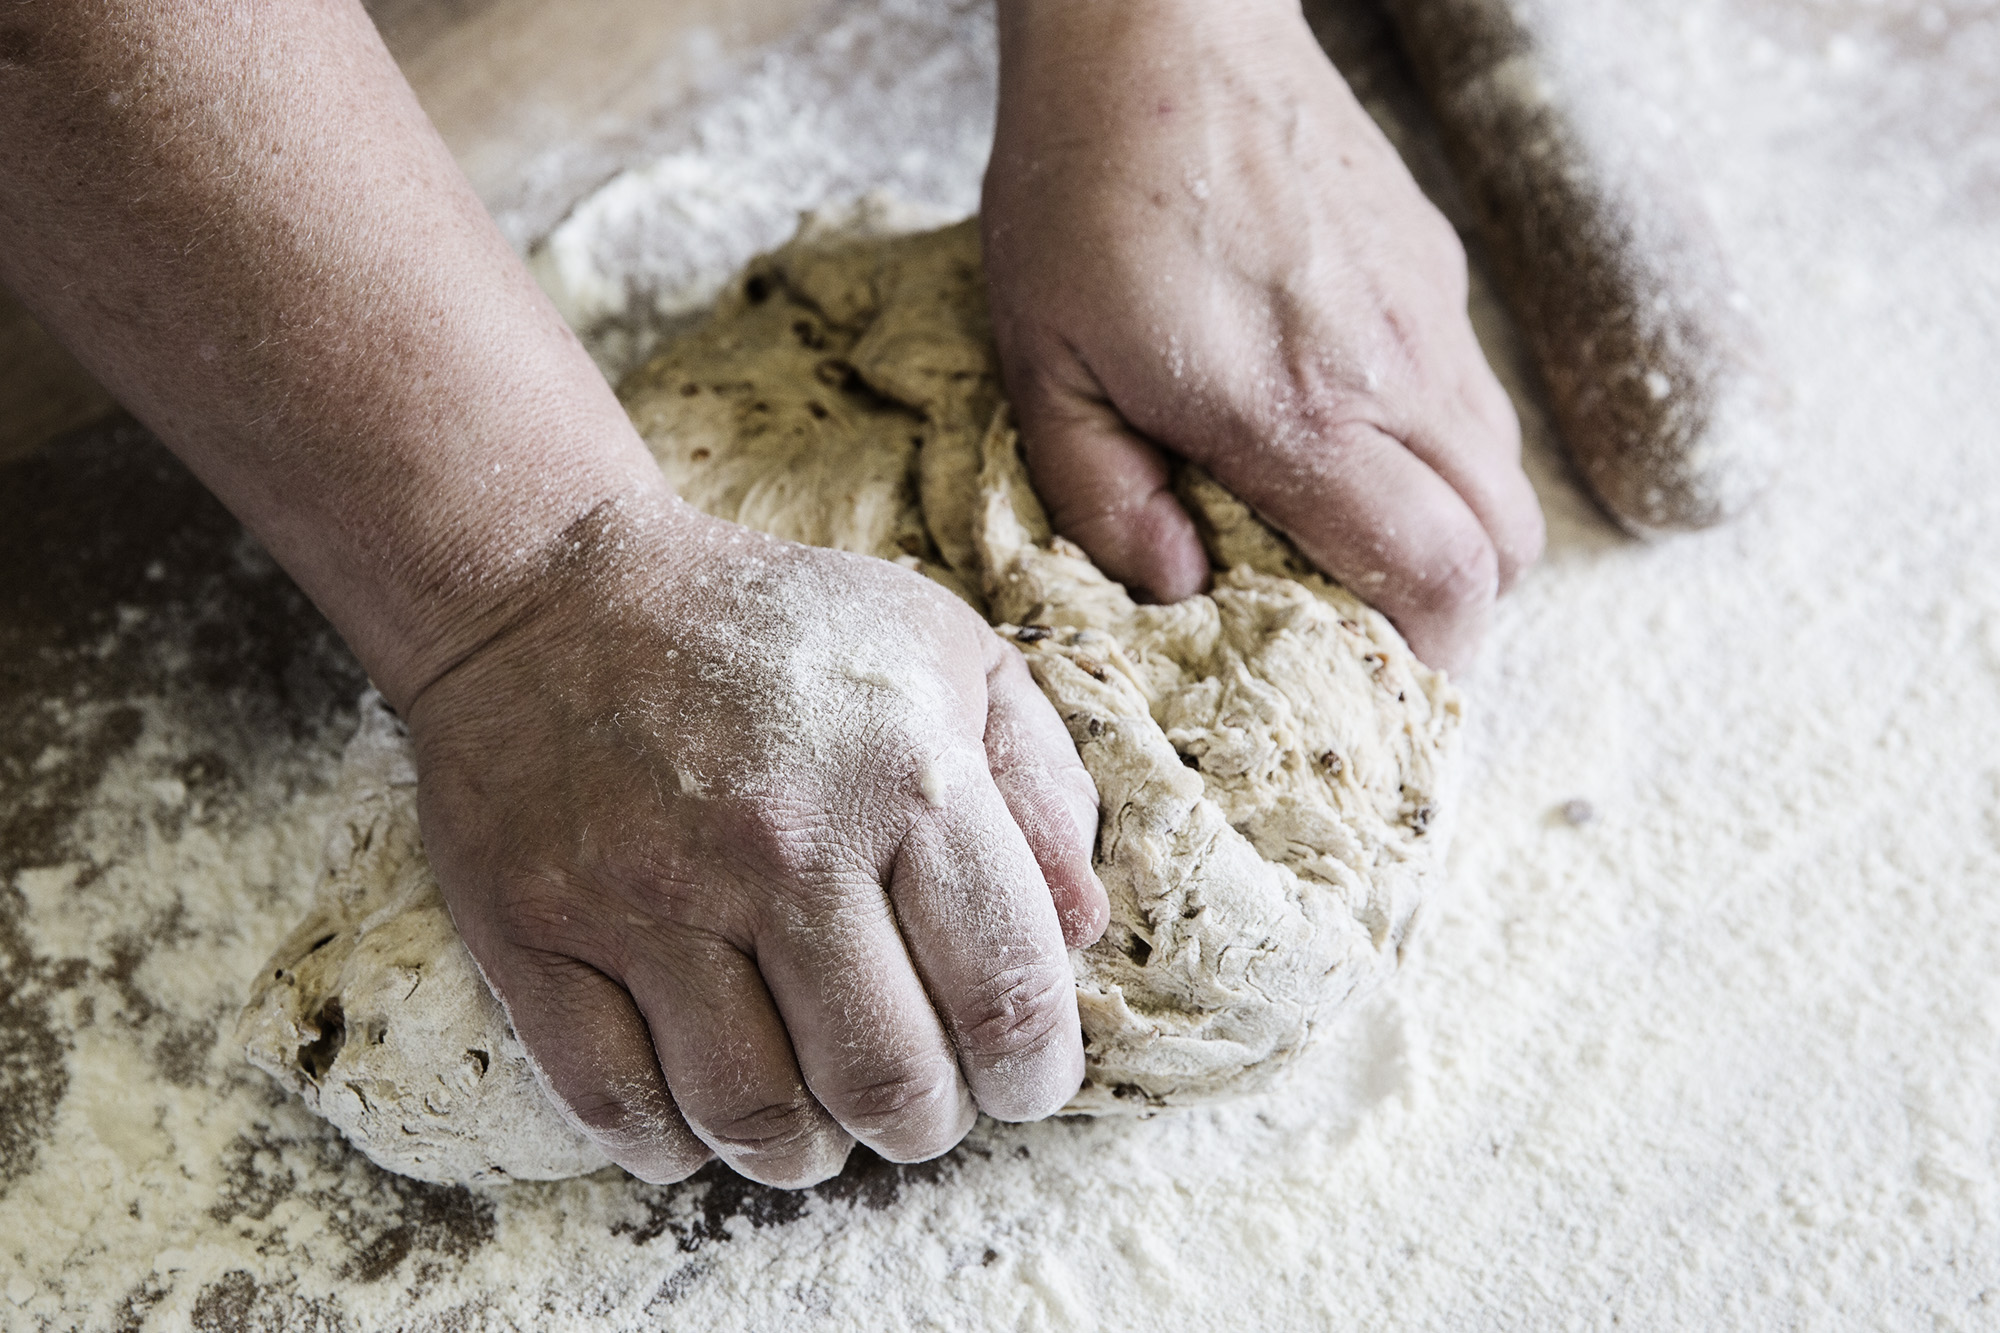 The Crusty Cob - Devon Family Bakery